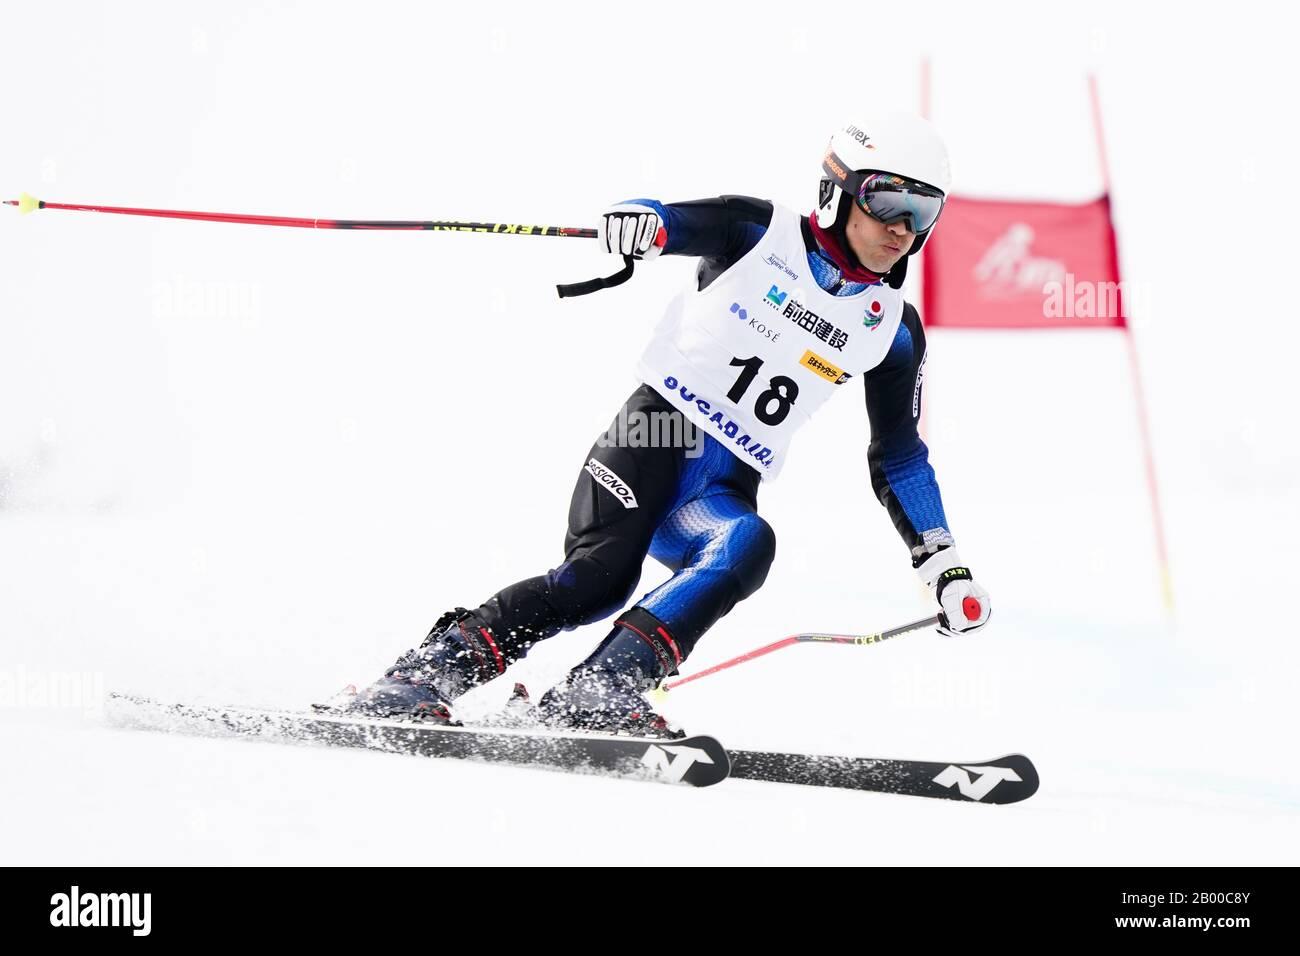 Ueda, Nagano, Japan. 14th Feb, 2020. Yoshihito Ito (JPN), February 14, 2020 - Alpine Skiing : Men's Giant Slalom Standing at Sugadaira Pine Beak during 2020 World Para Alpine Skiing Asia Cup in Ueda, Nagano, Japan. Credit: SportsPressJP/AFLO/Alamy Live News Stock Photo